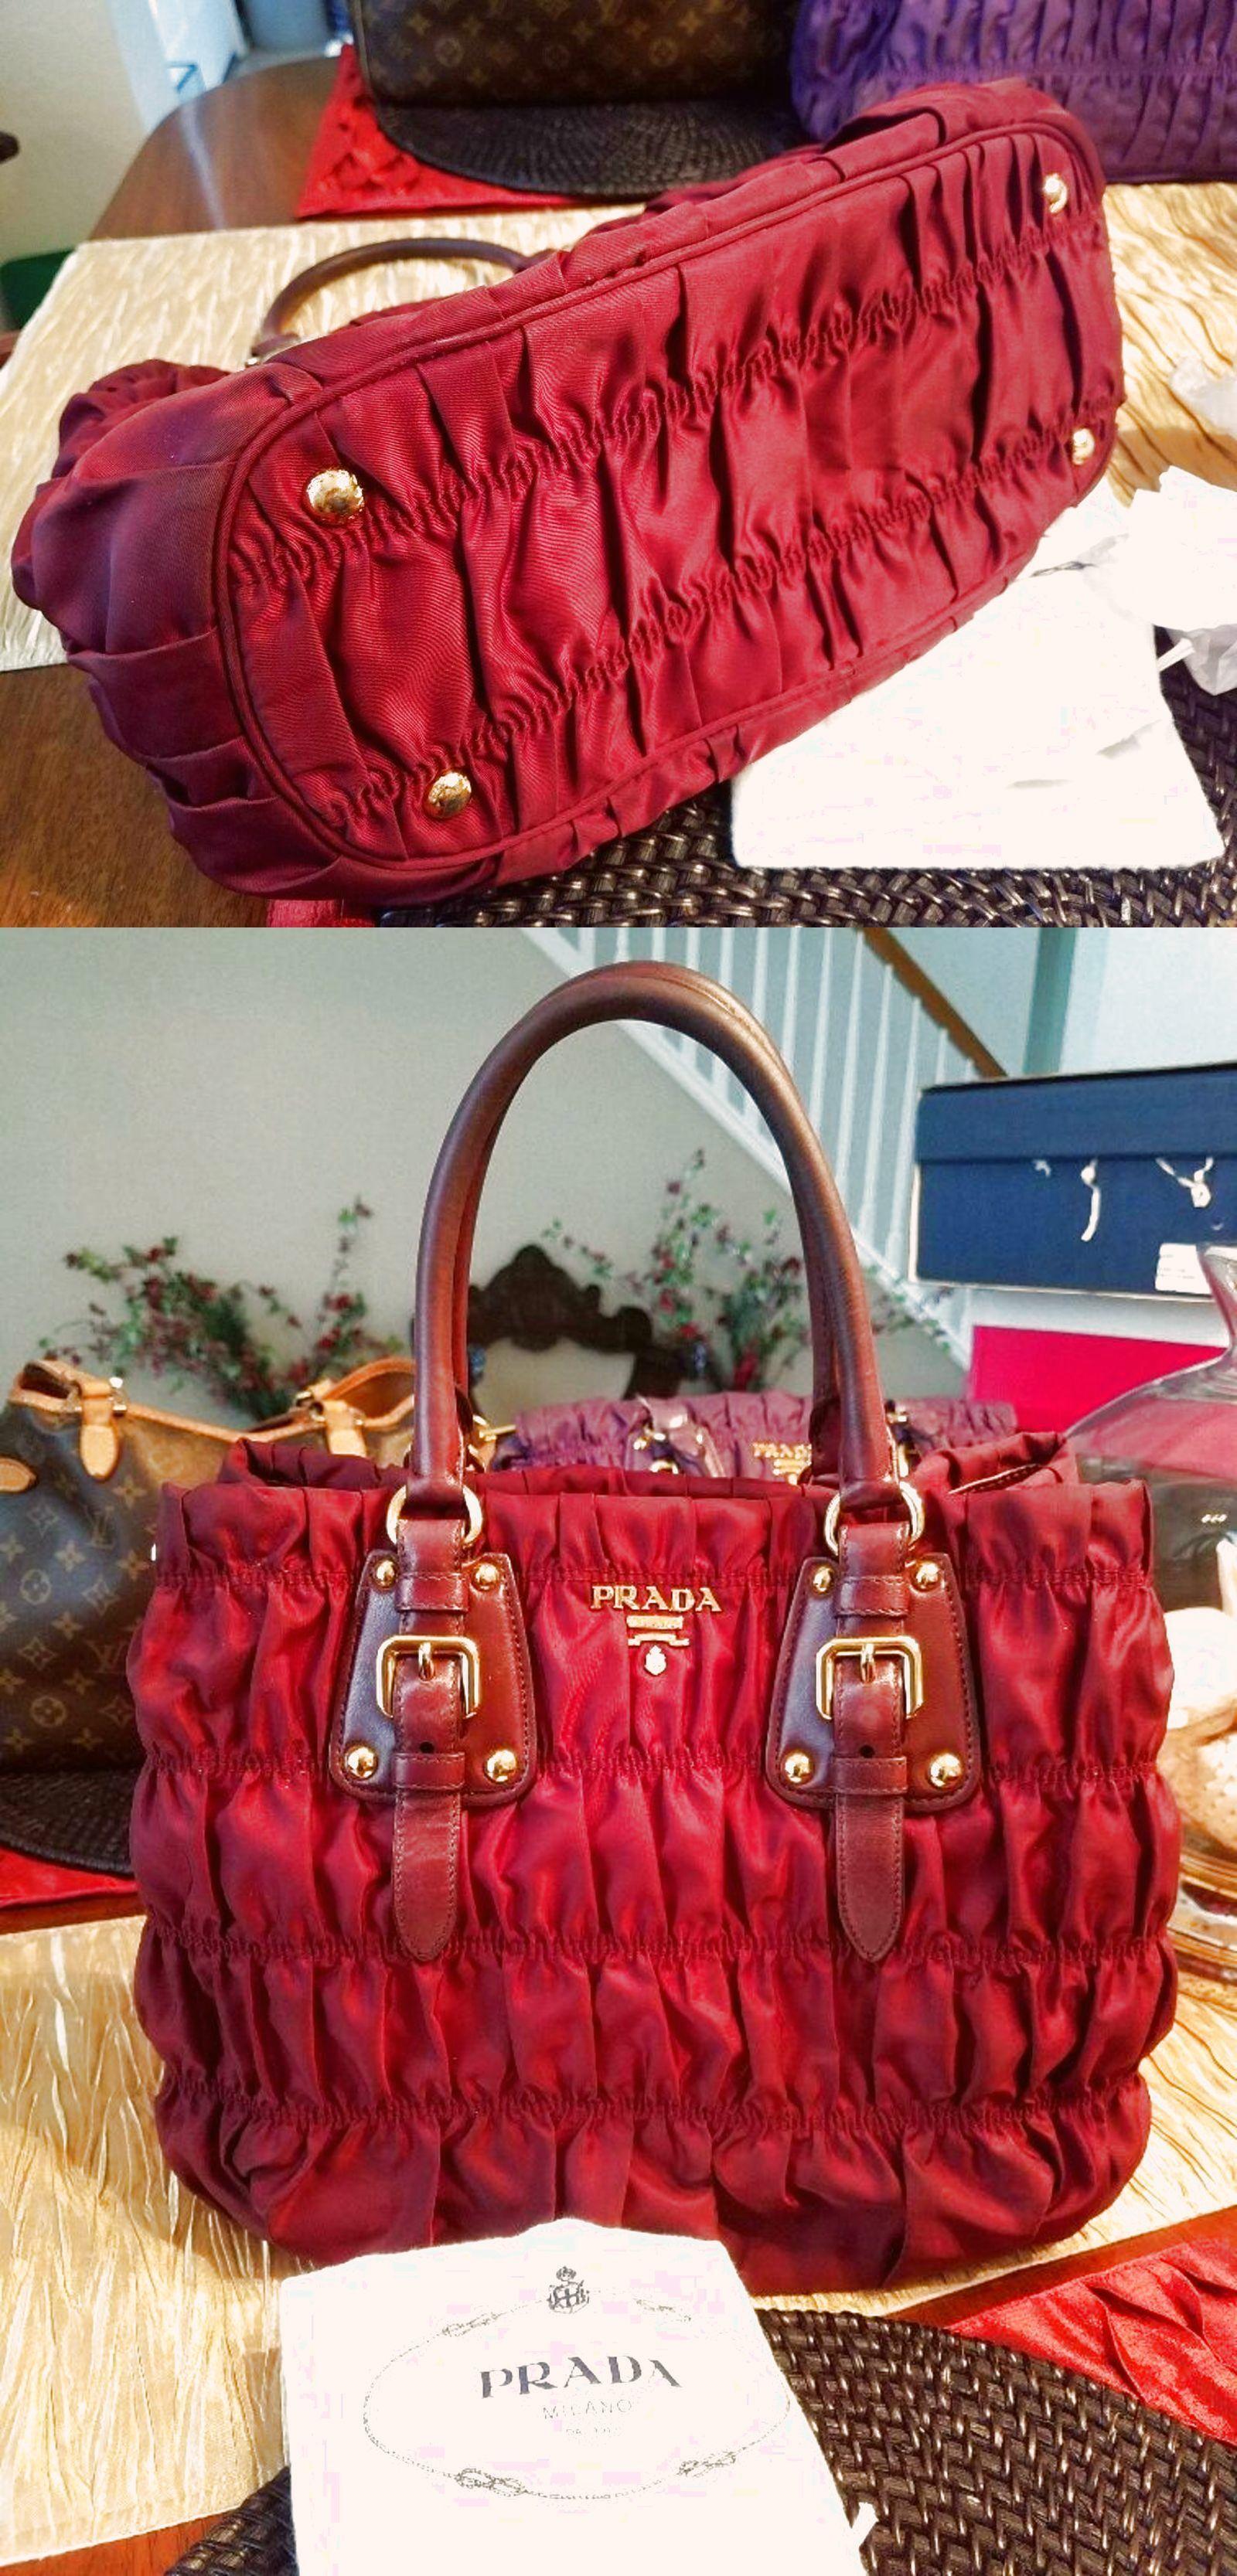 89465c3e08ae Authentic Prada Burgundy Nylon/Leather Tessuto Gaufre Handbag $429.0 ...